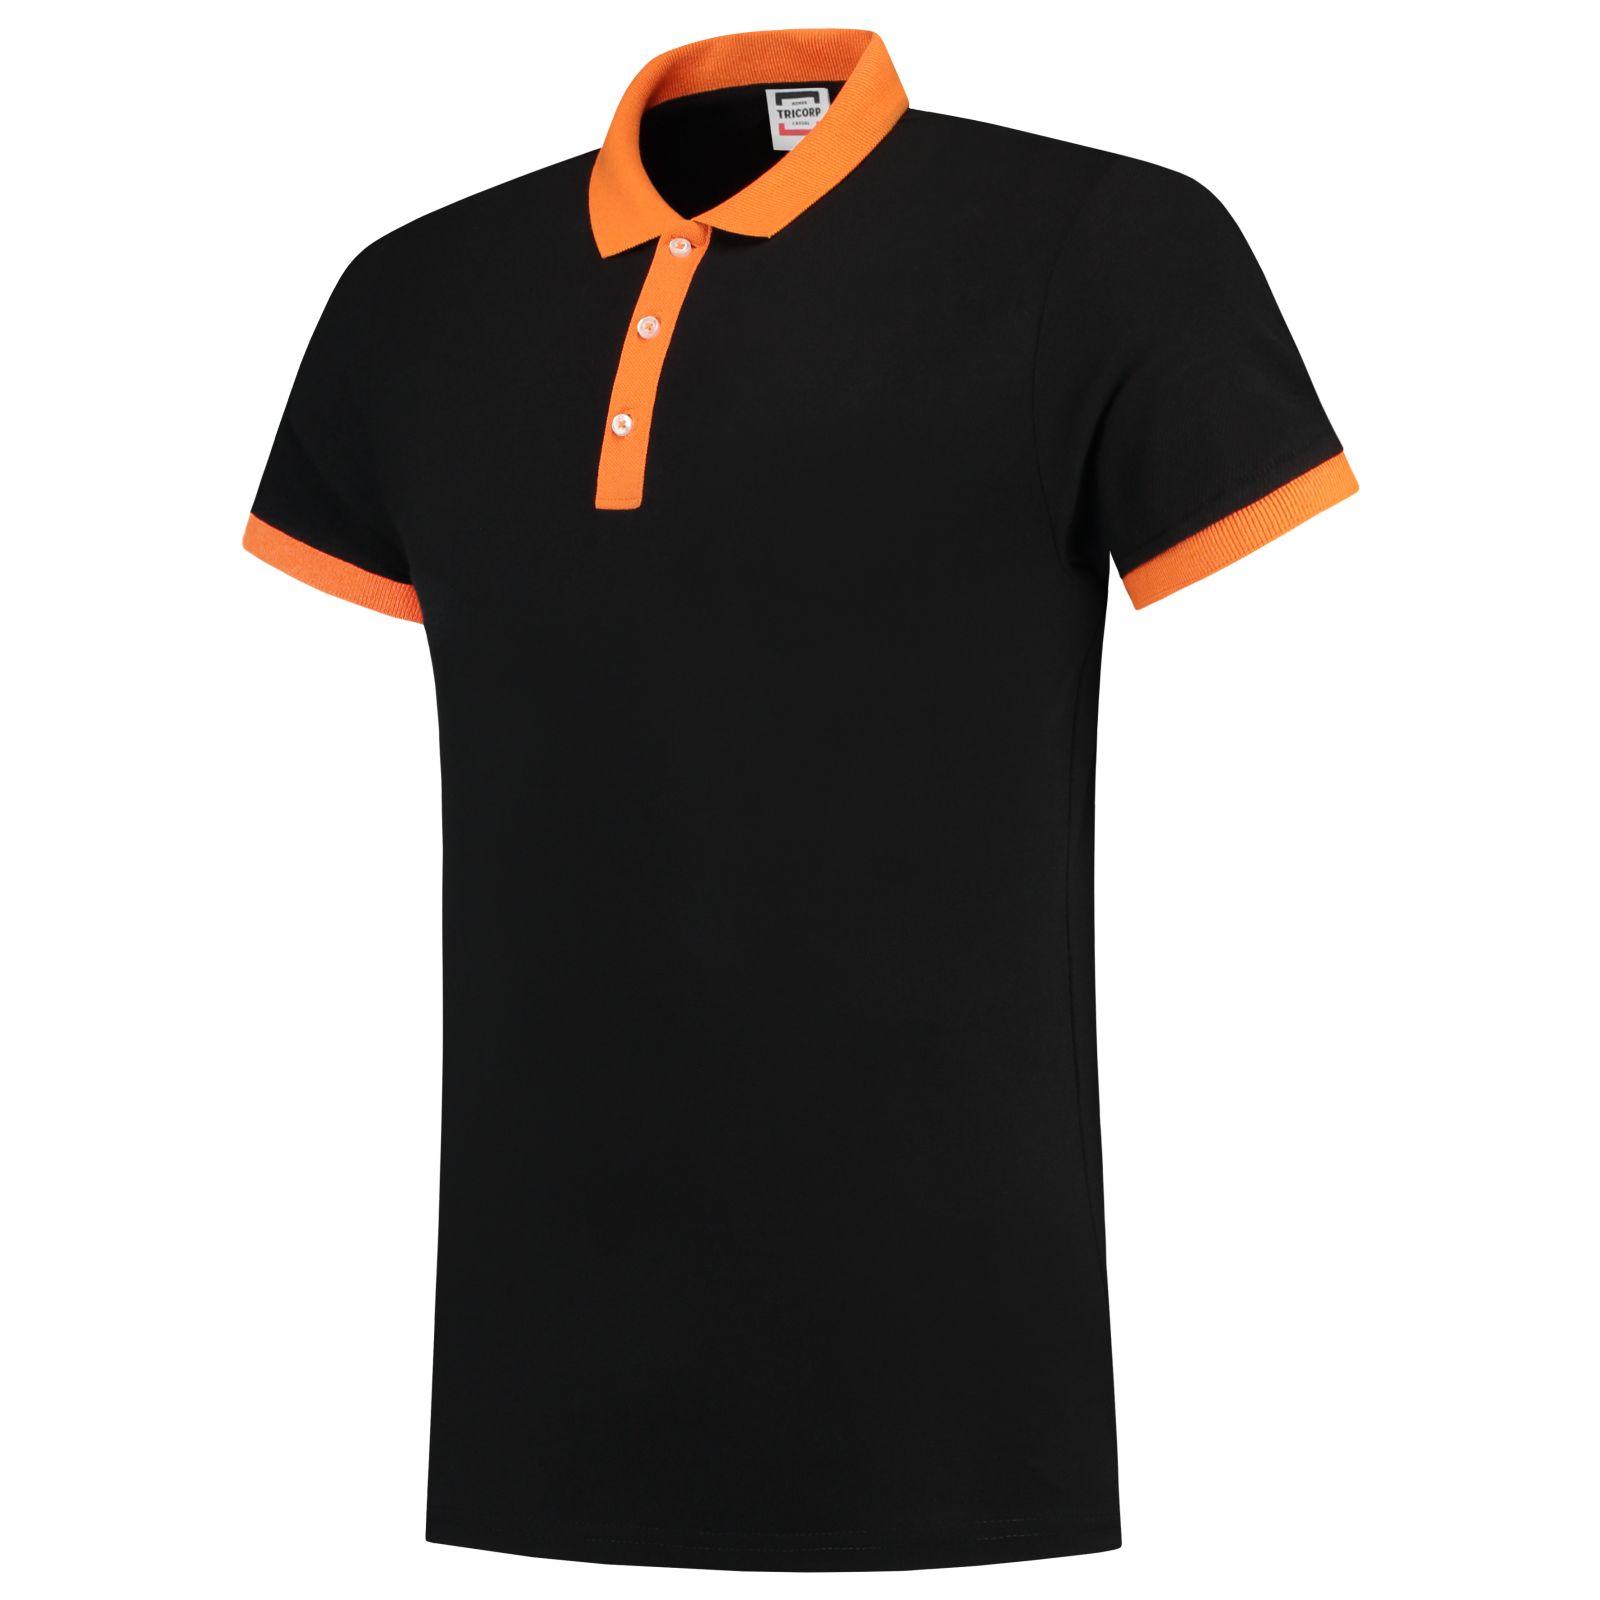 Tricorp Casual Poloshirts 201002-PBF210 zwart-oranje(BlackOran)